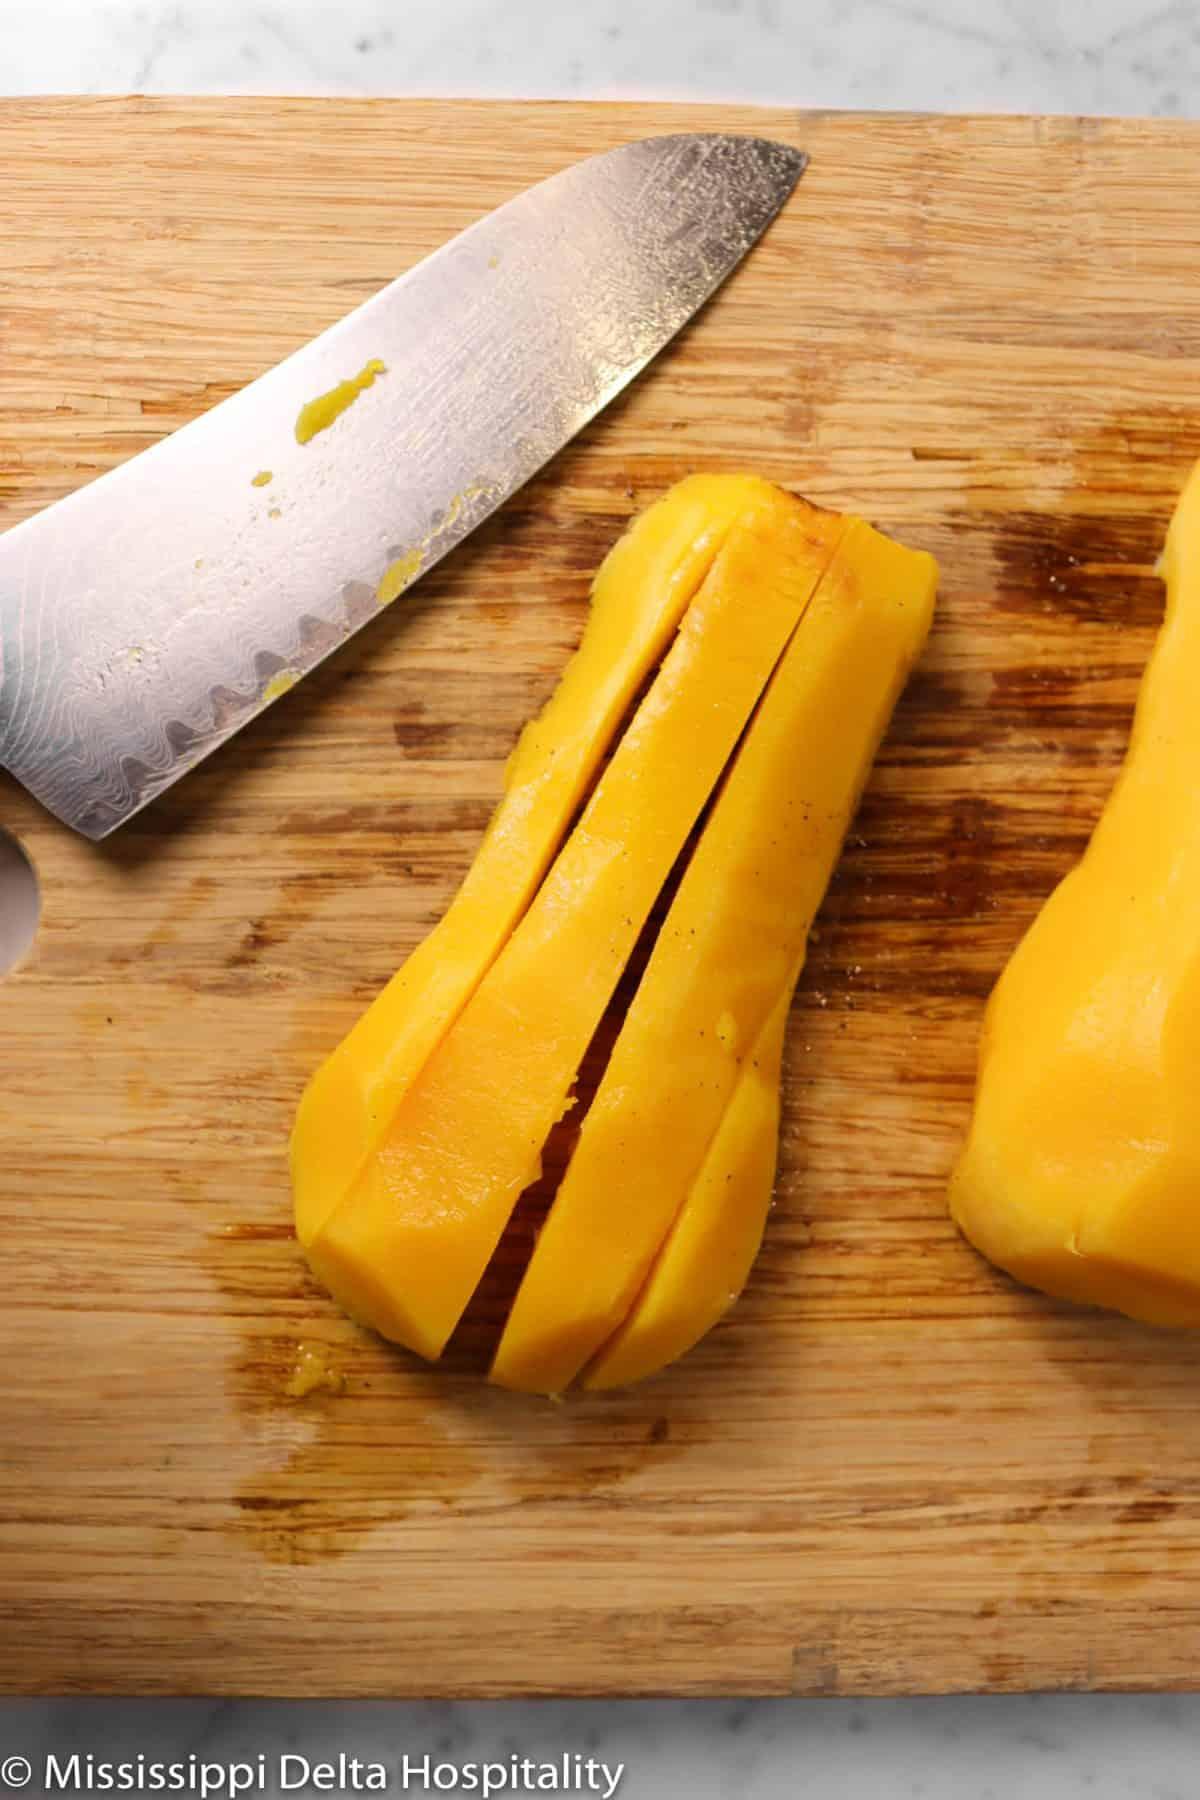 butternut squash cut lengthwise